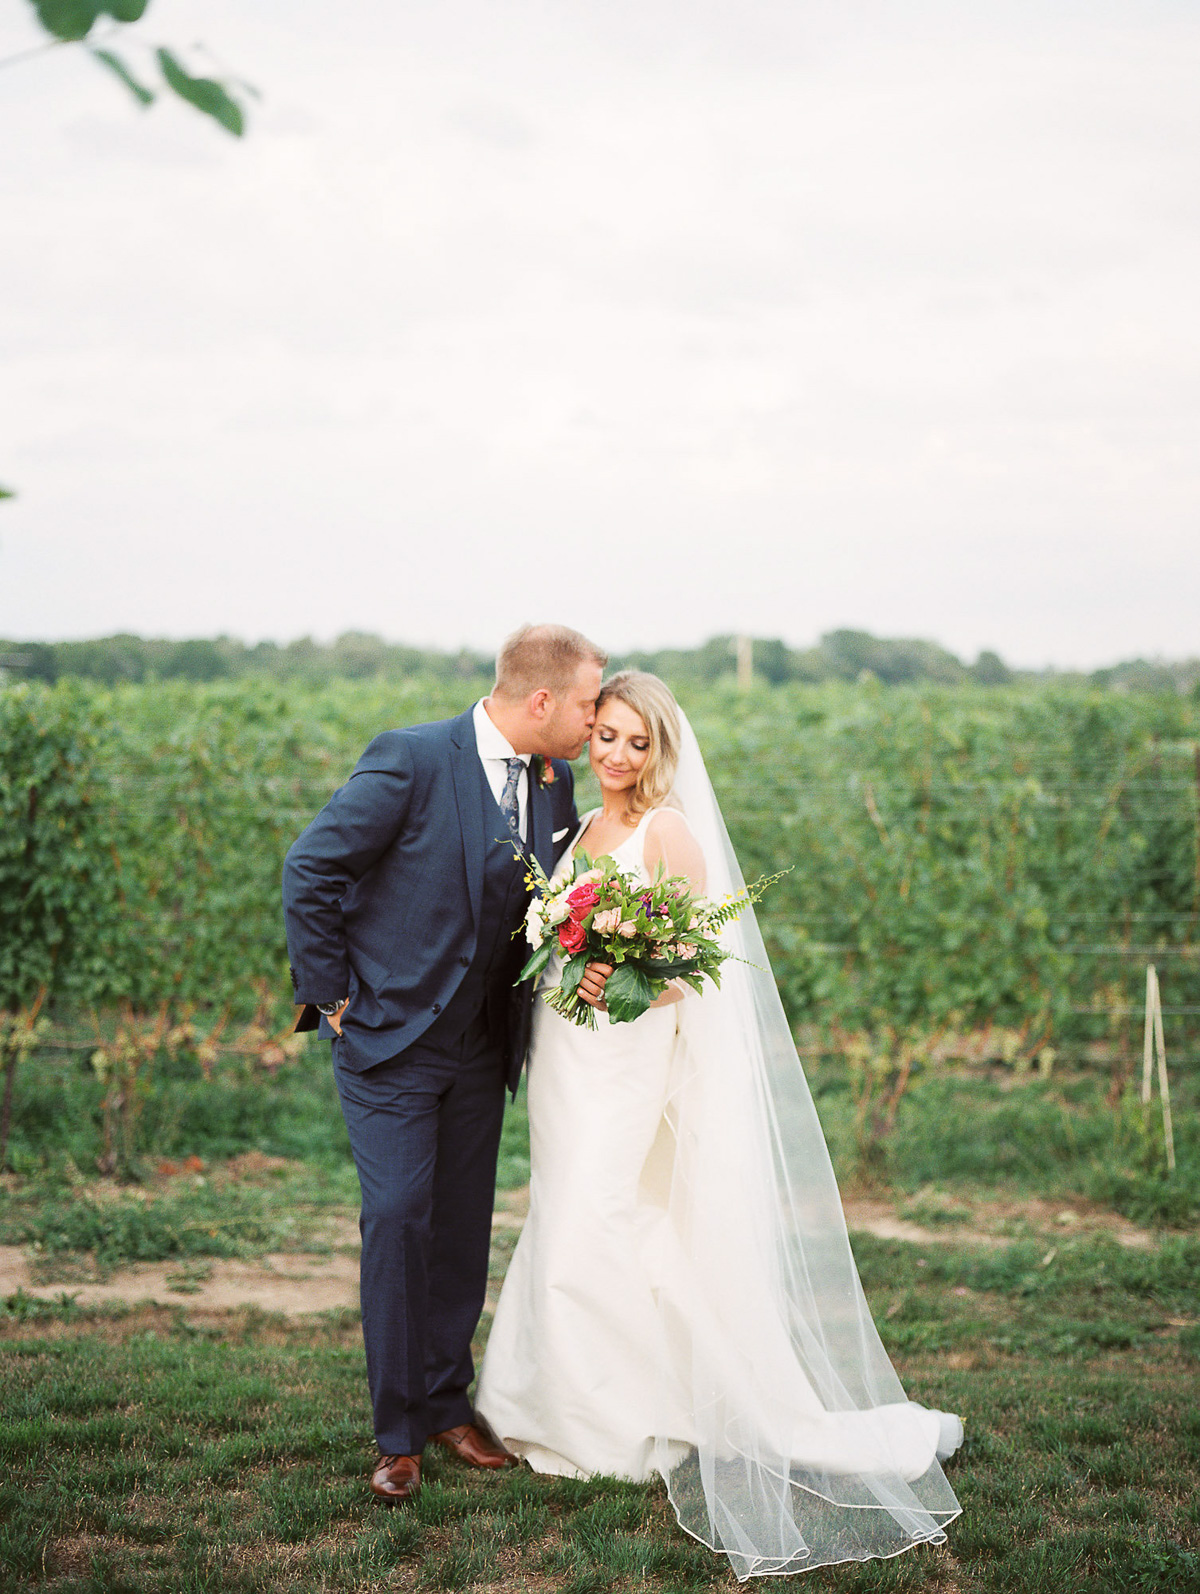 julia-park-photography-vineyard-bride-swish-list-stratus-winery-niagara-on-the-lake-wedding-26.jpg